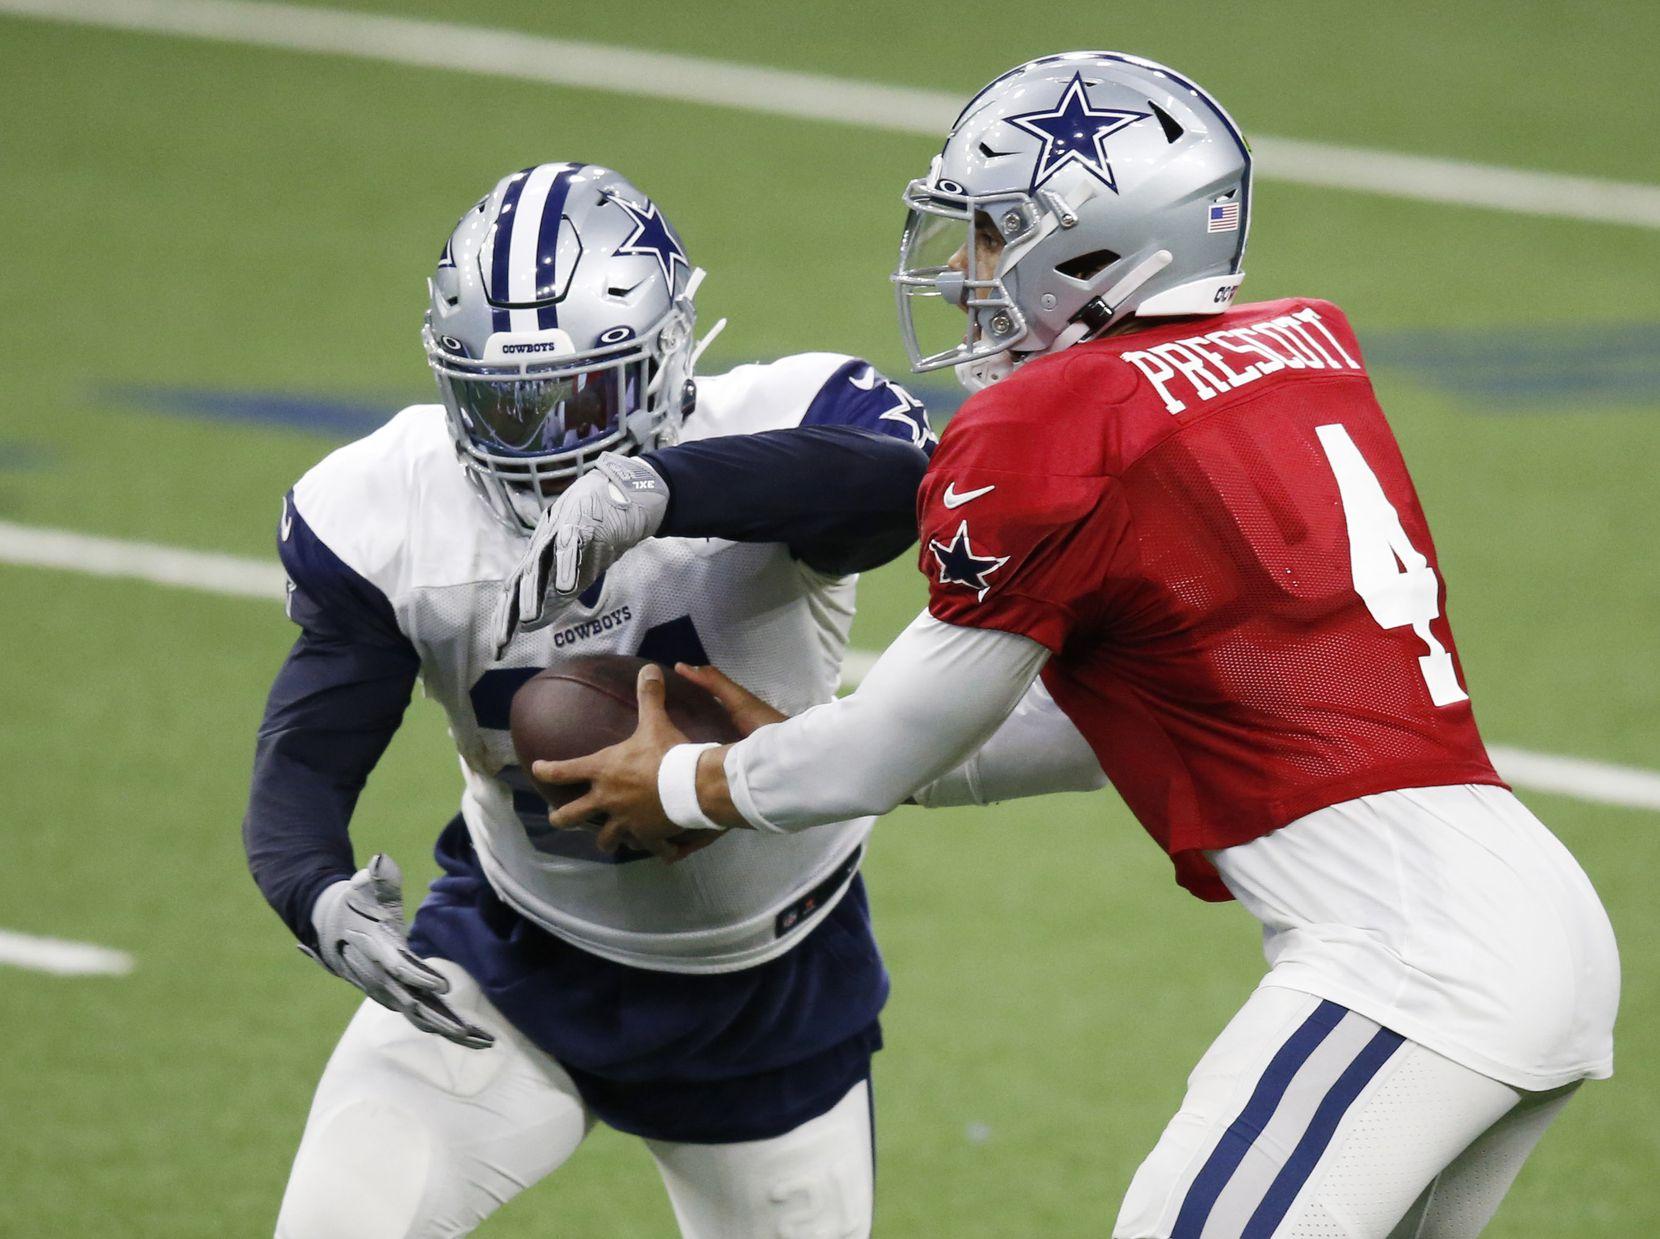 Dallas Cowboys quarterback Dak Prescott (4) hands the ball off to Dallas Cowboys running back Ezekiel Elliott (21) during training camp at the Dallas Cowboys headquarters at The Star in Frisco, Texas on Thursday, August 27, 2020. (Vernon Bryant/The Dallas Morning News)